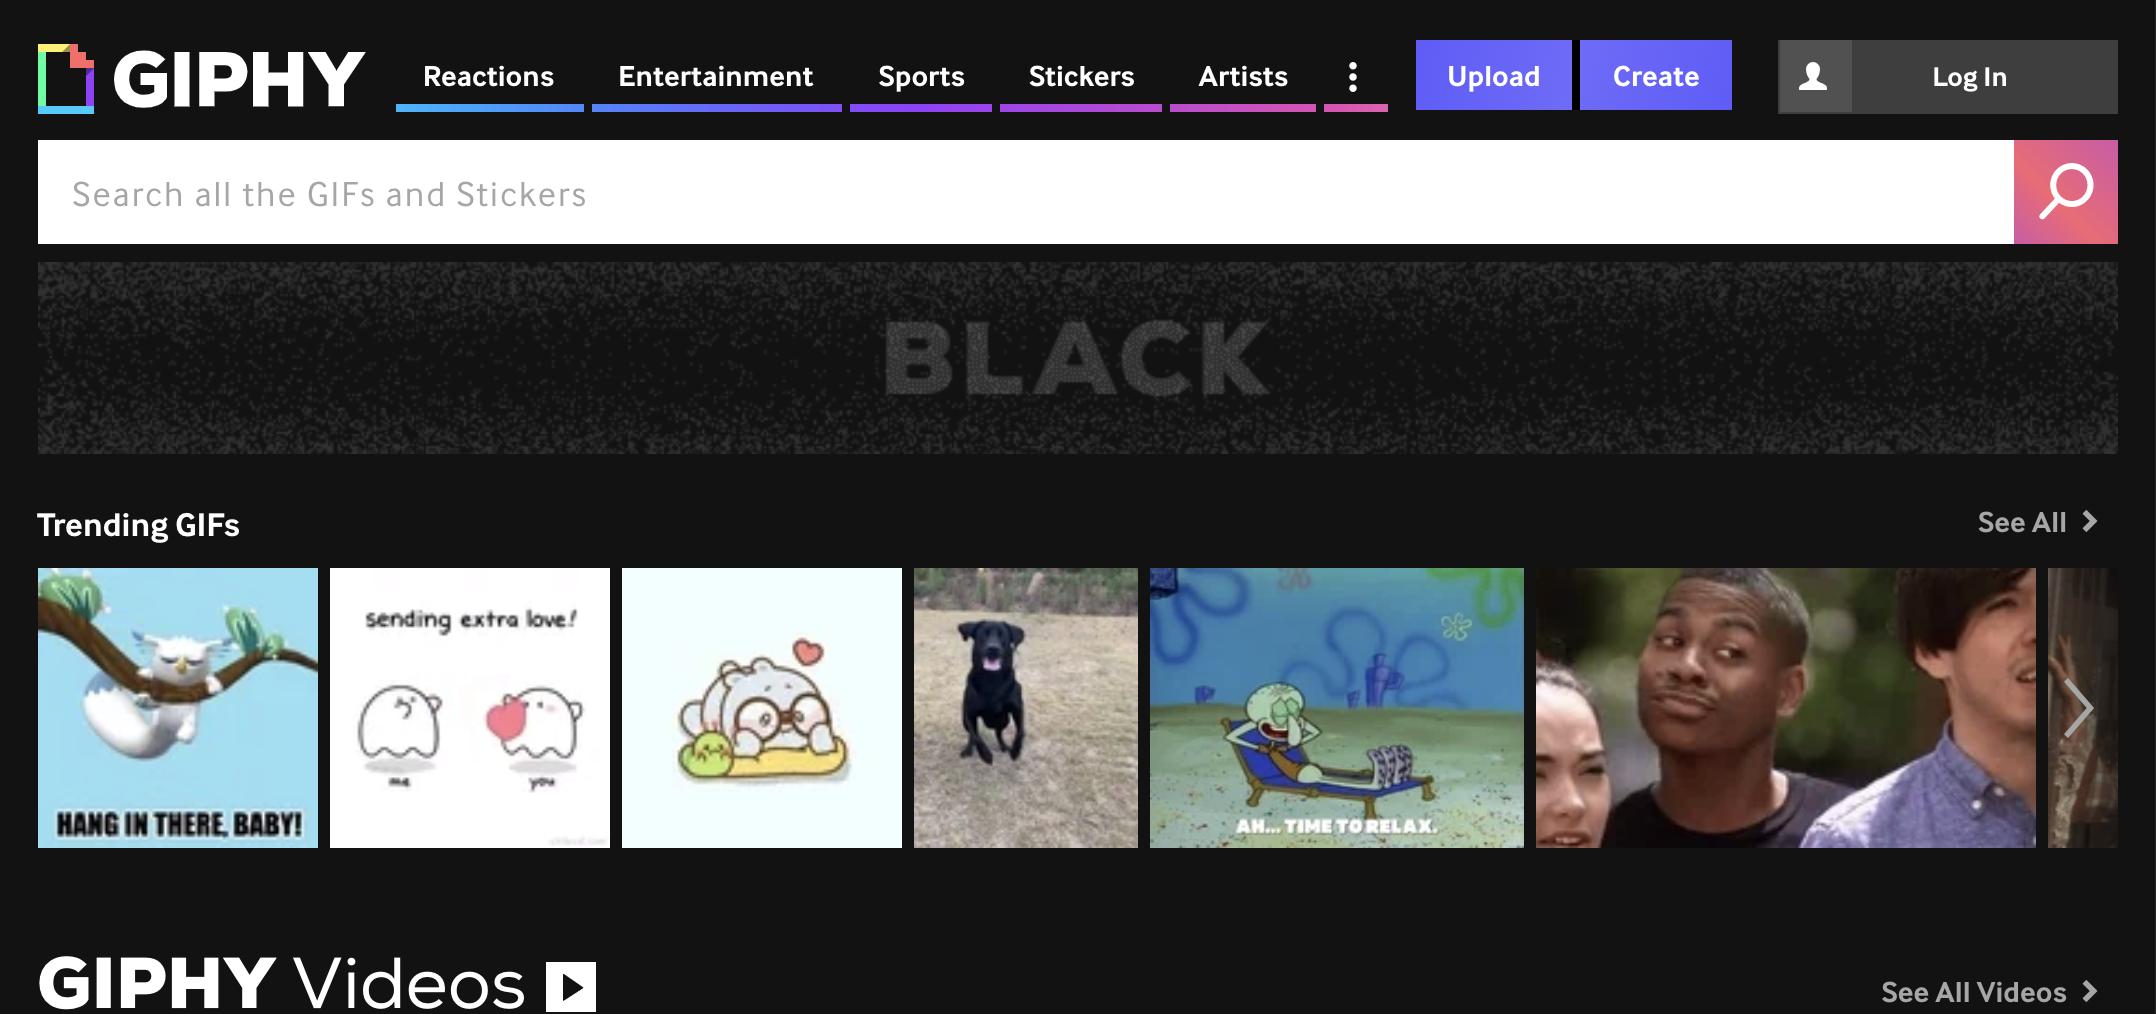 giphy.com